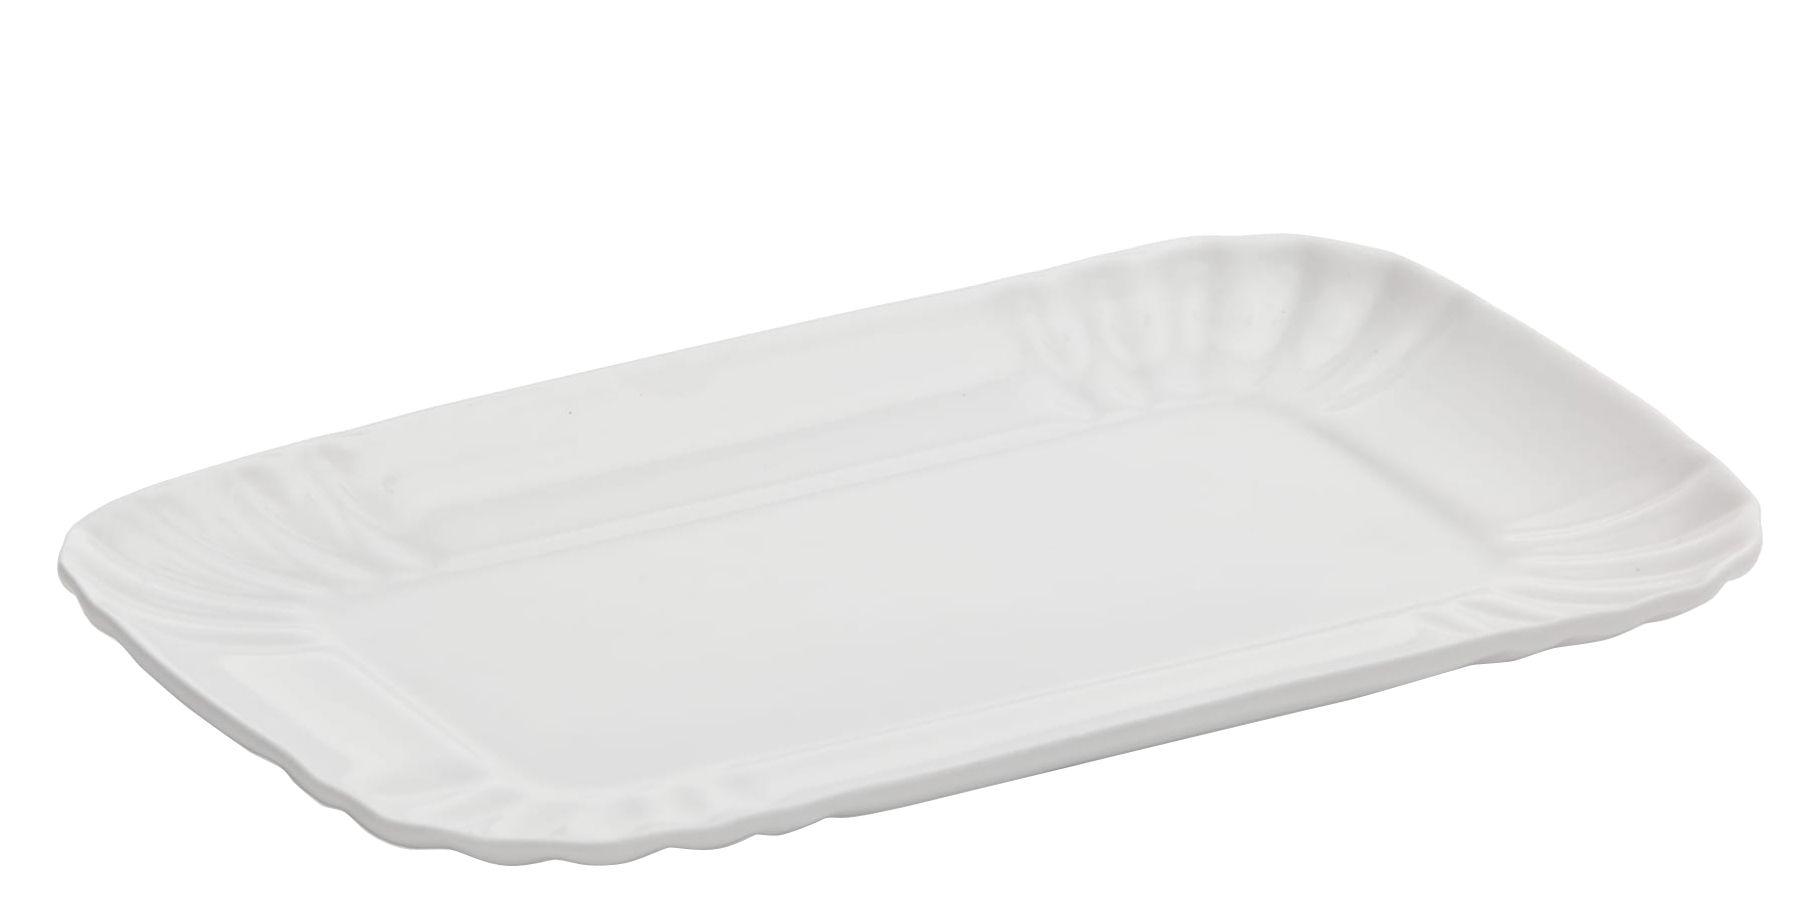 Arts de la table - Assiettes - Assiette à dessert Estetico Quotidiano / Small - 13 x 20 cm - Seletti - Small / 13 x 20 cm - Porcelaine